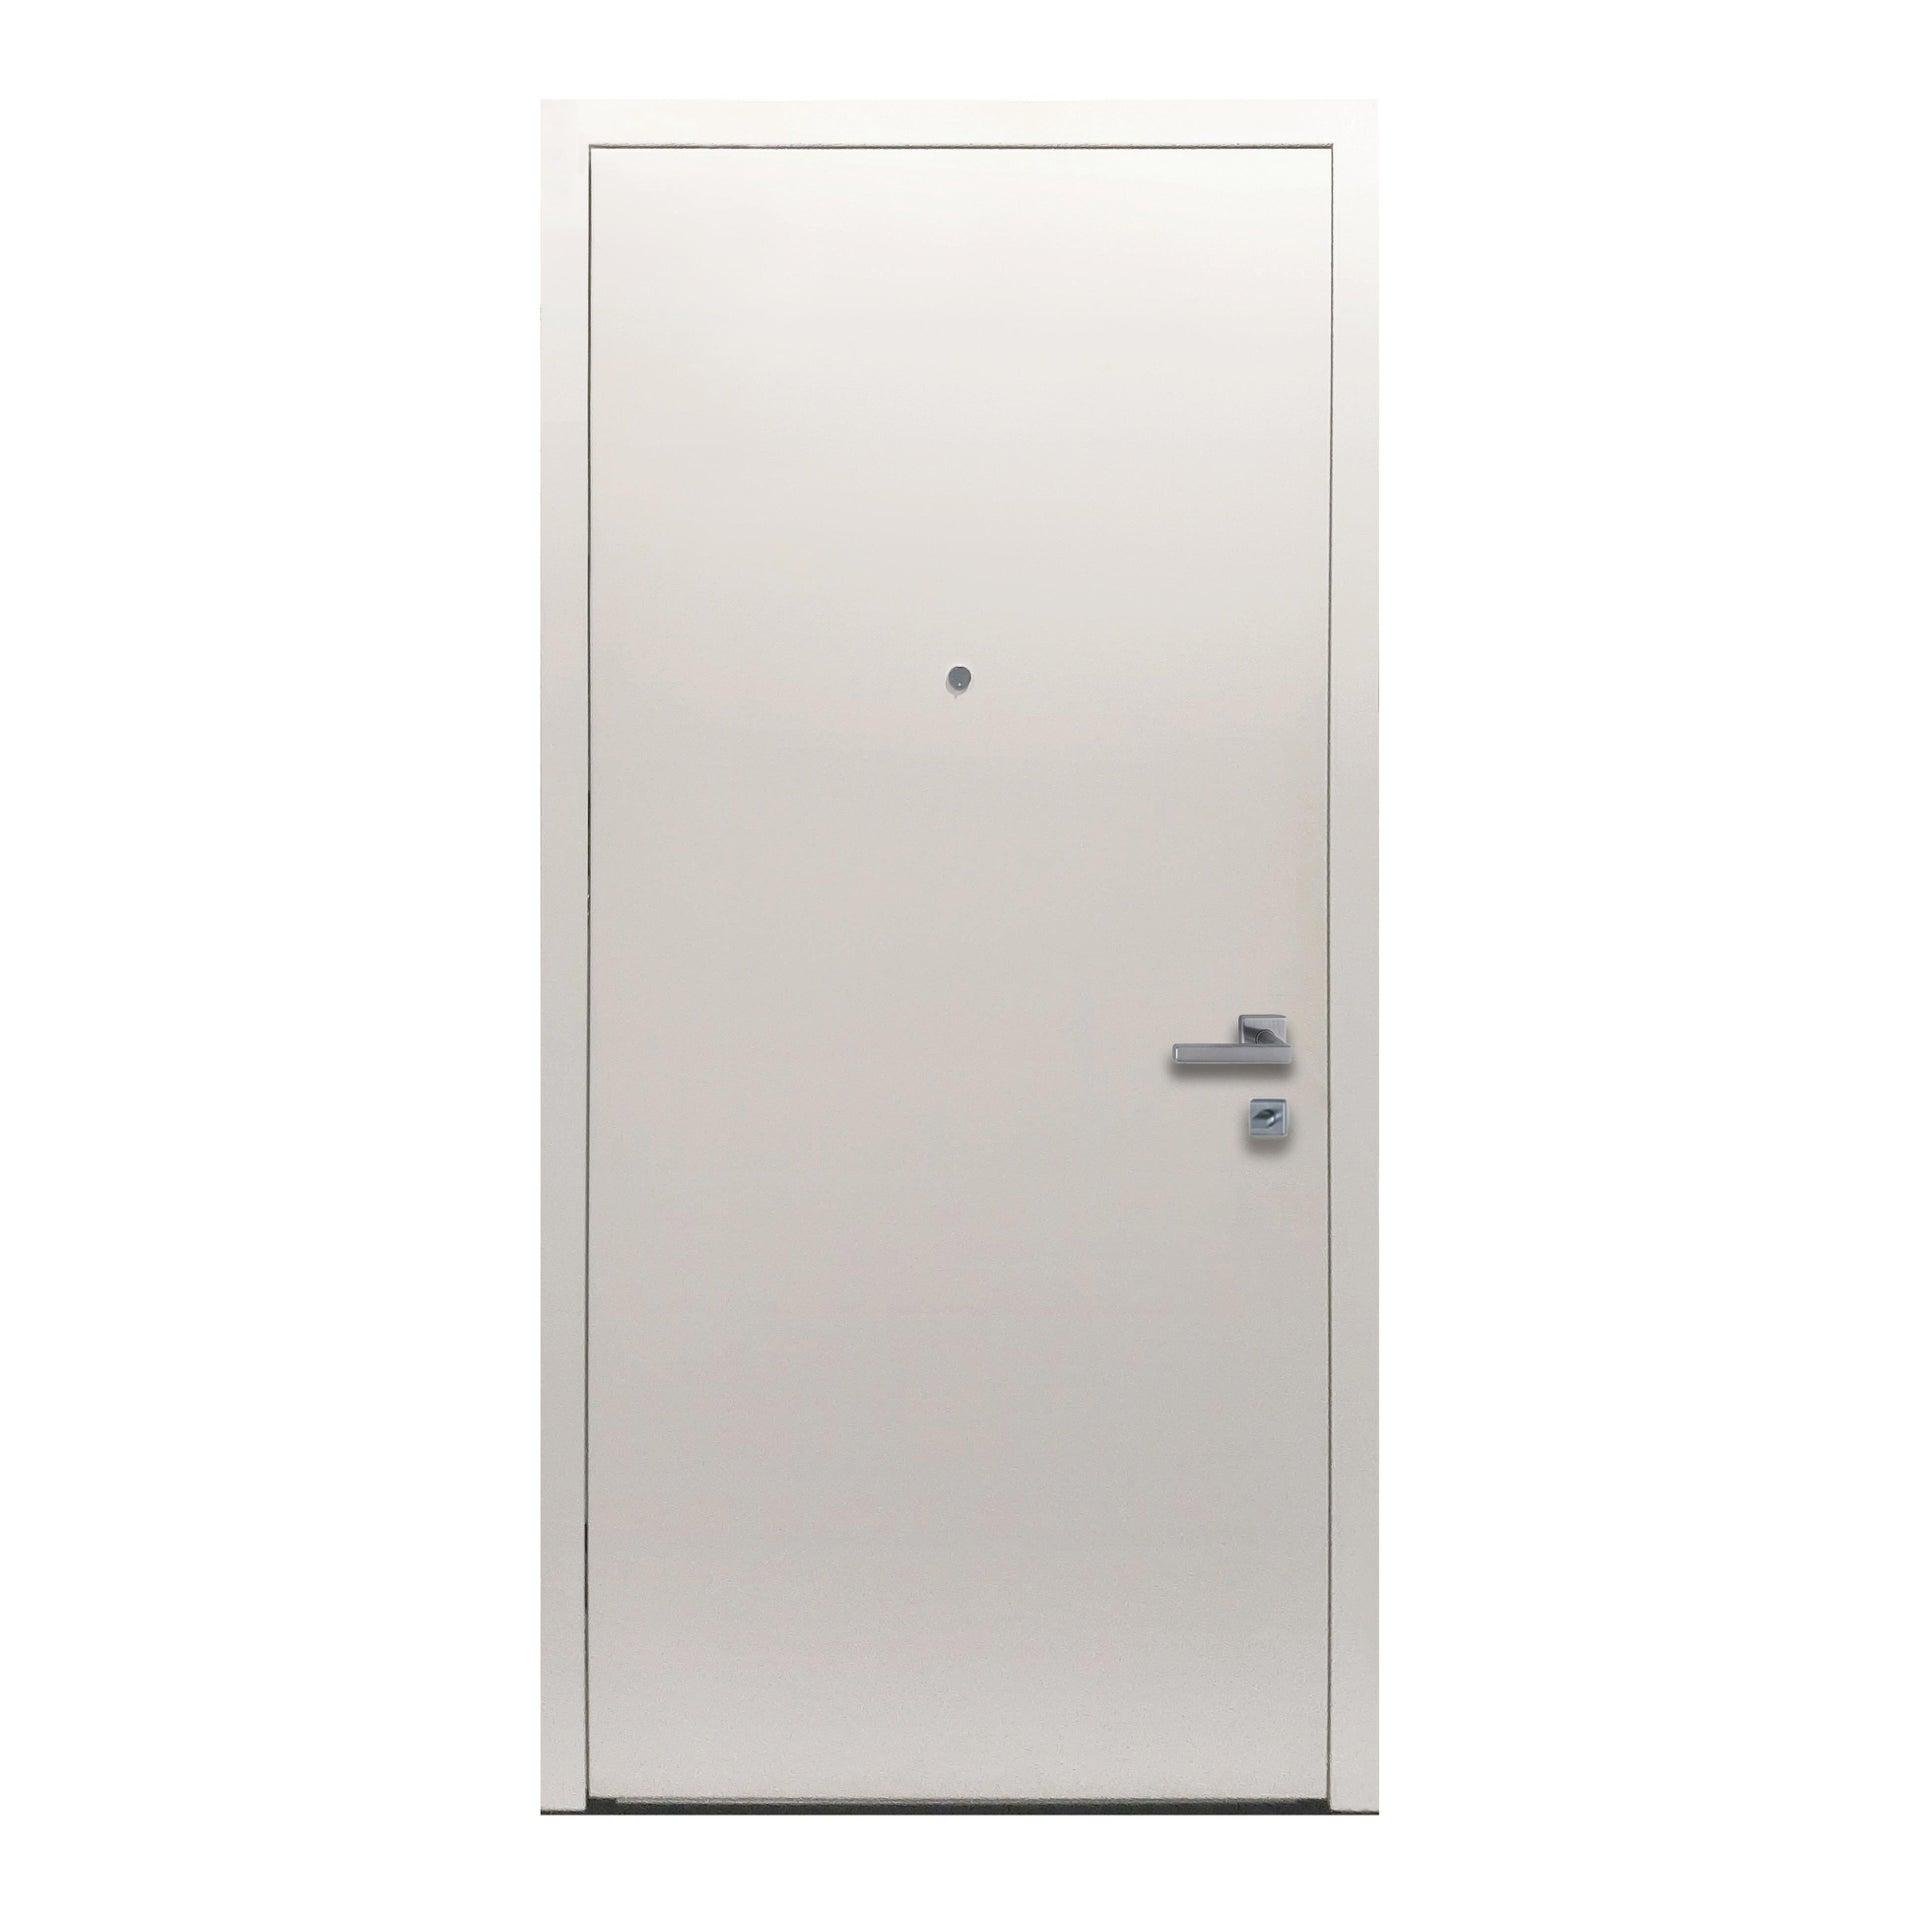 Porta blindata Invisible grigio L 90 x H 210 cm destra - 2